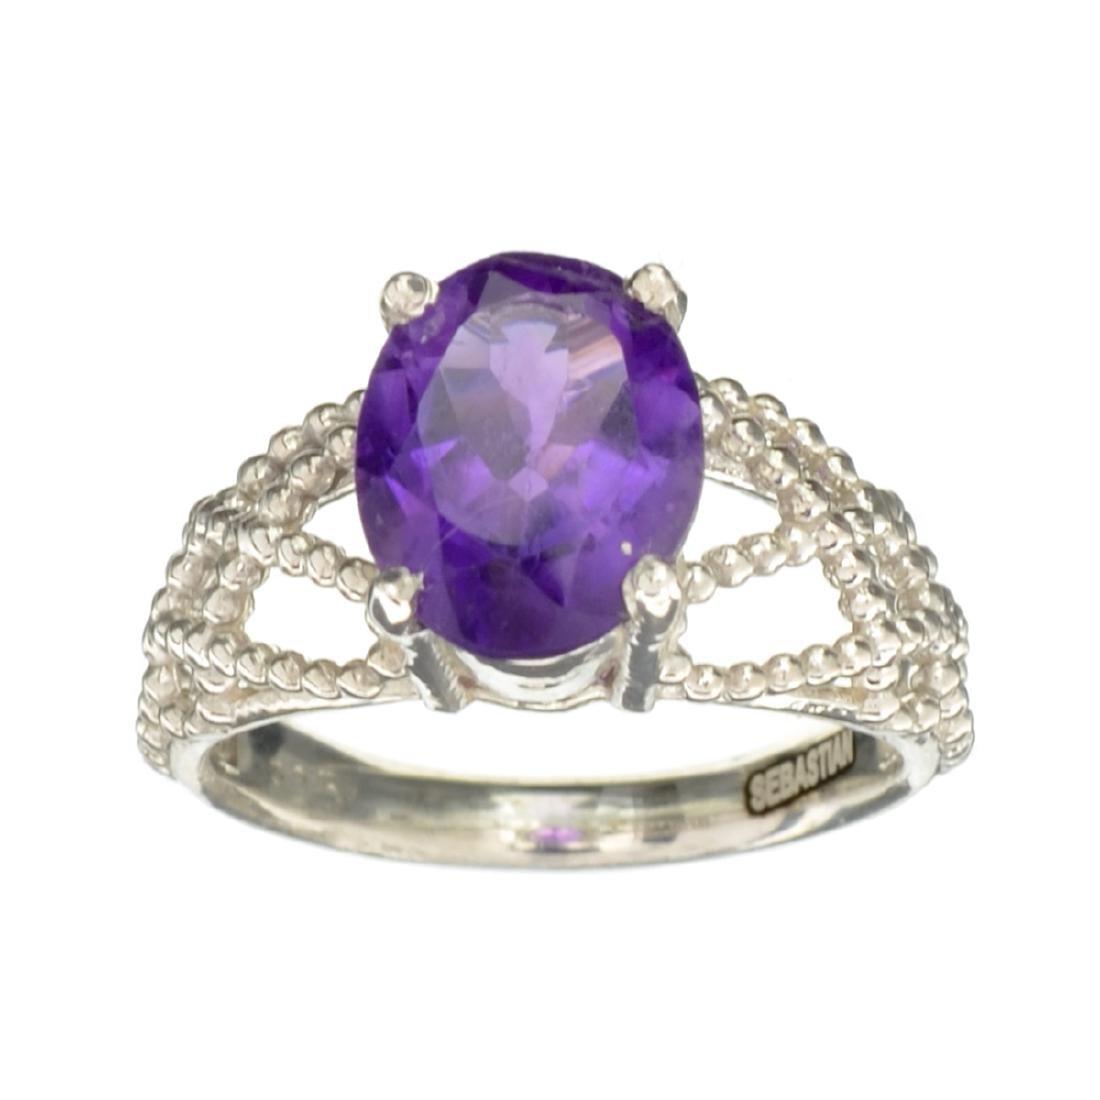 APP: 0.5k Fine Jewelry Designer Sebastian, 2.15CT Oval